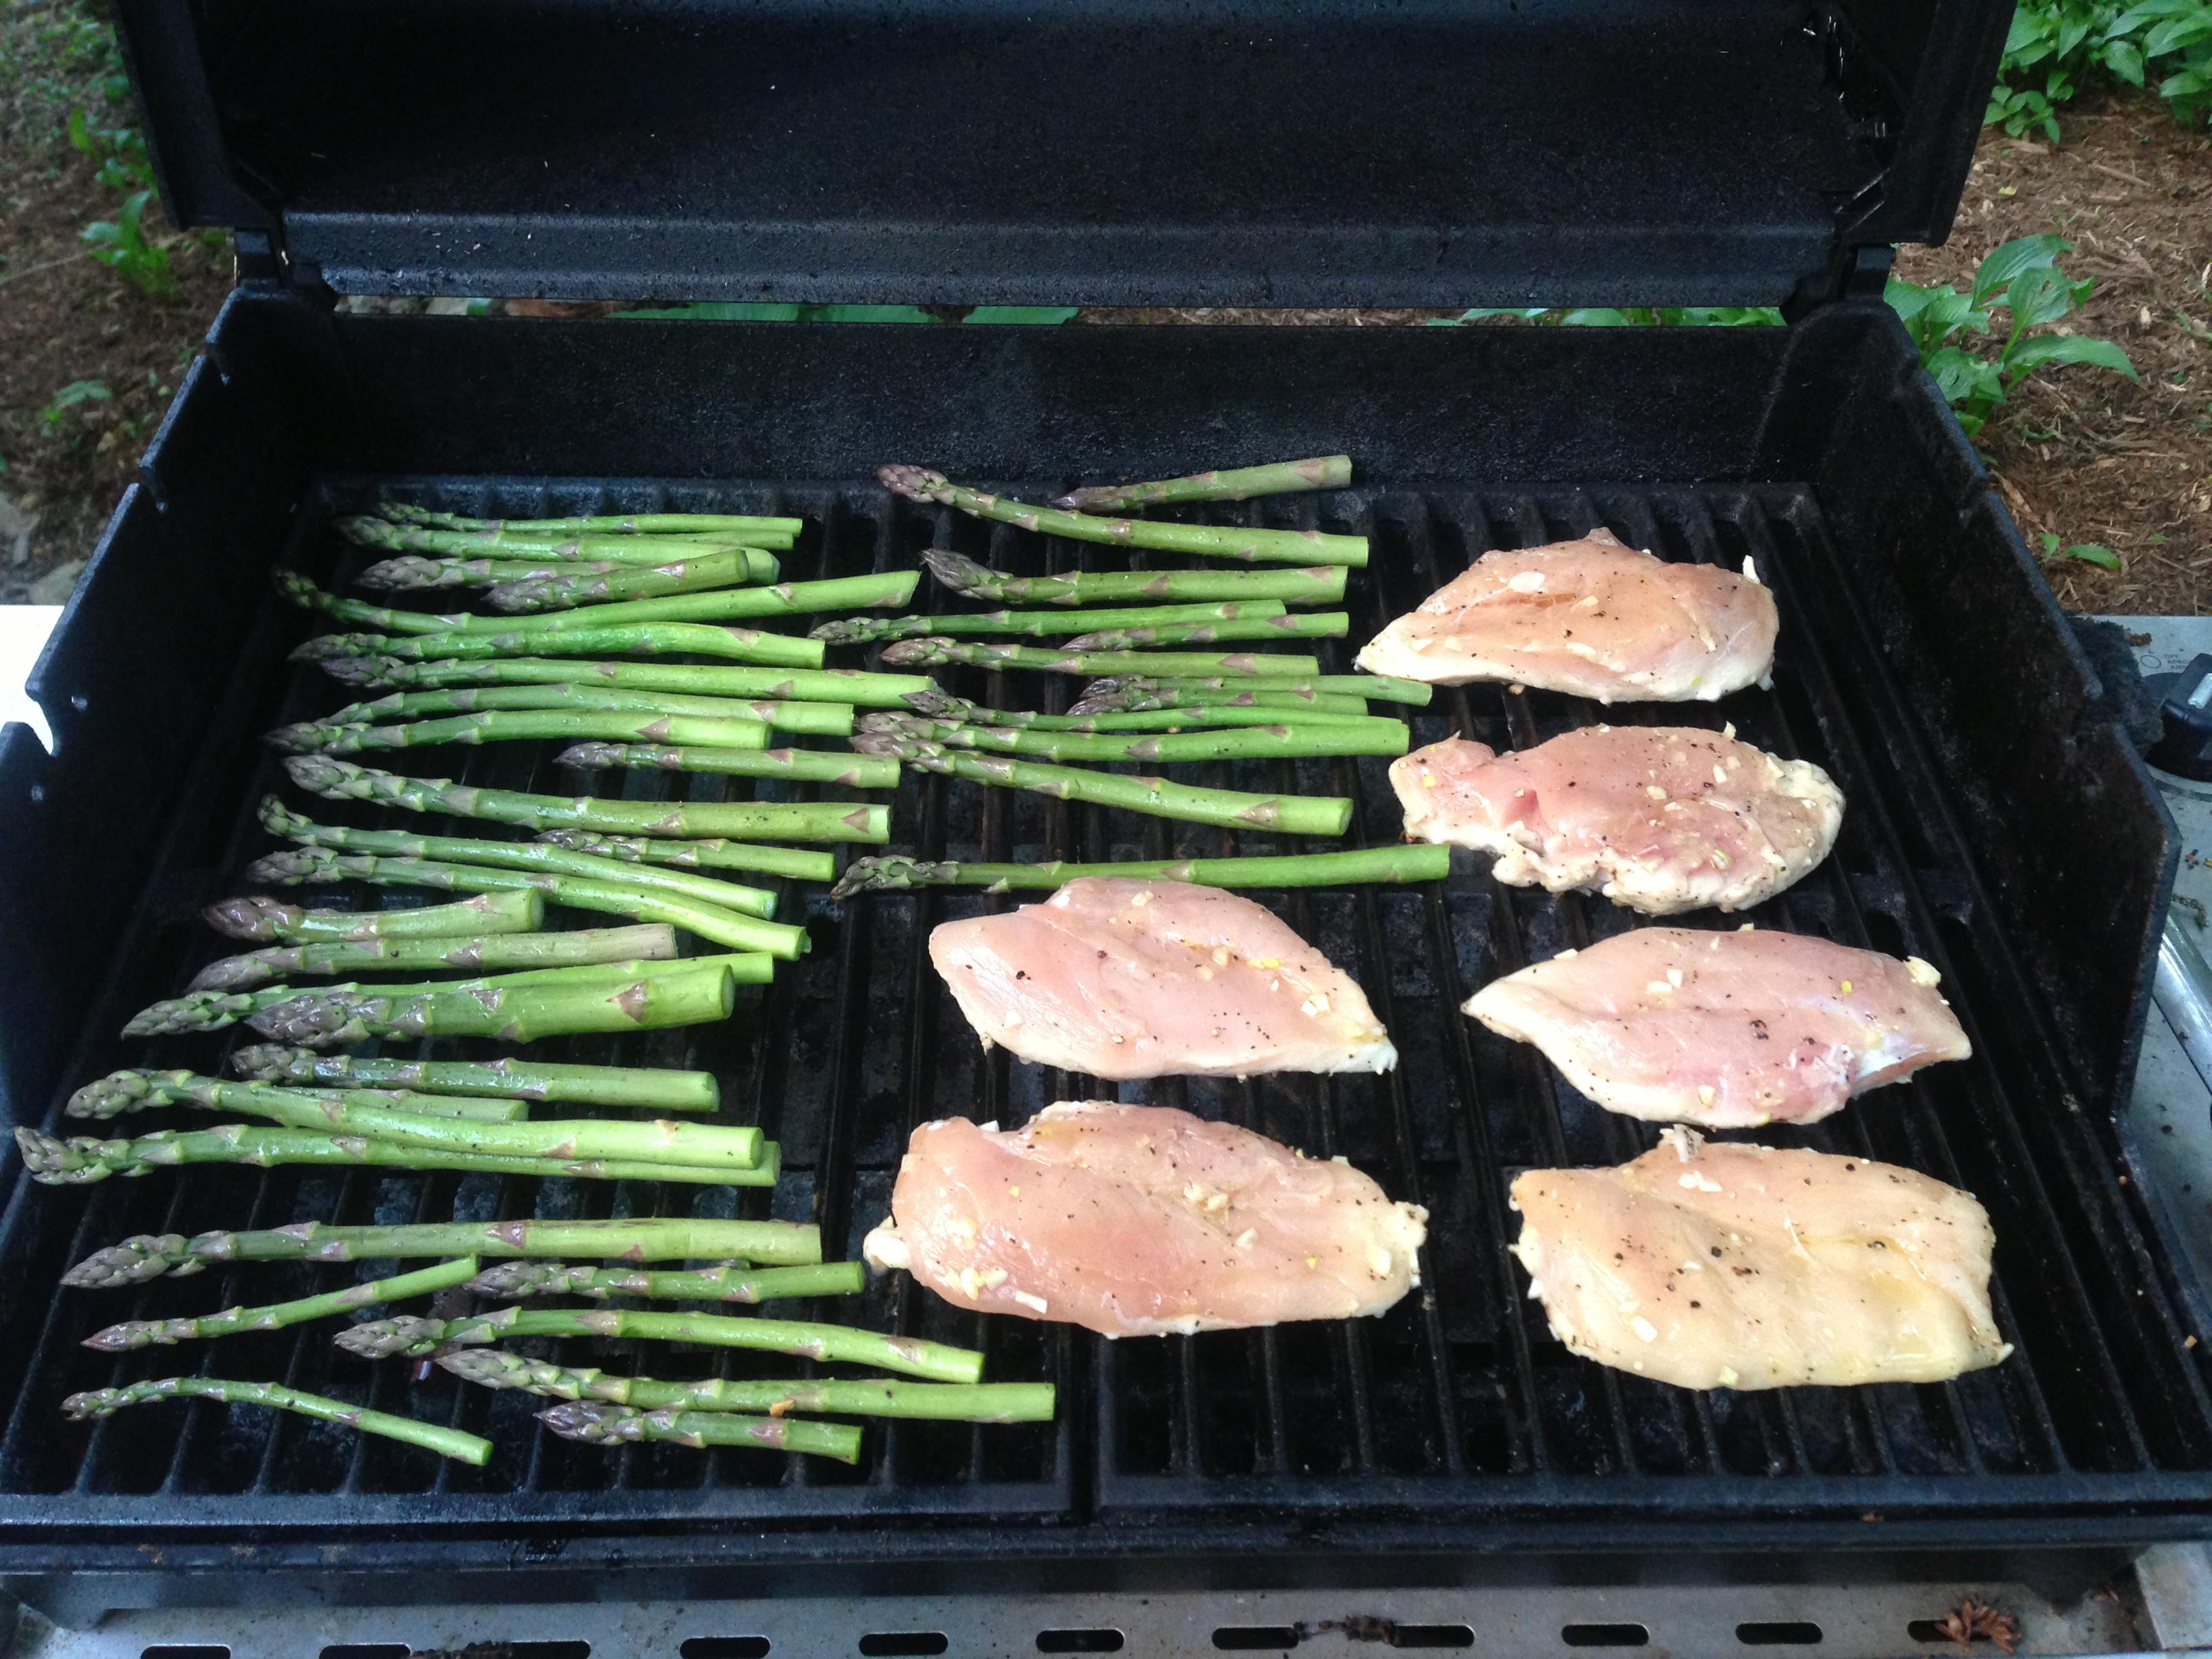 Grilled Garlicky Chicken with Asparagus and Avocado Bruschetta